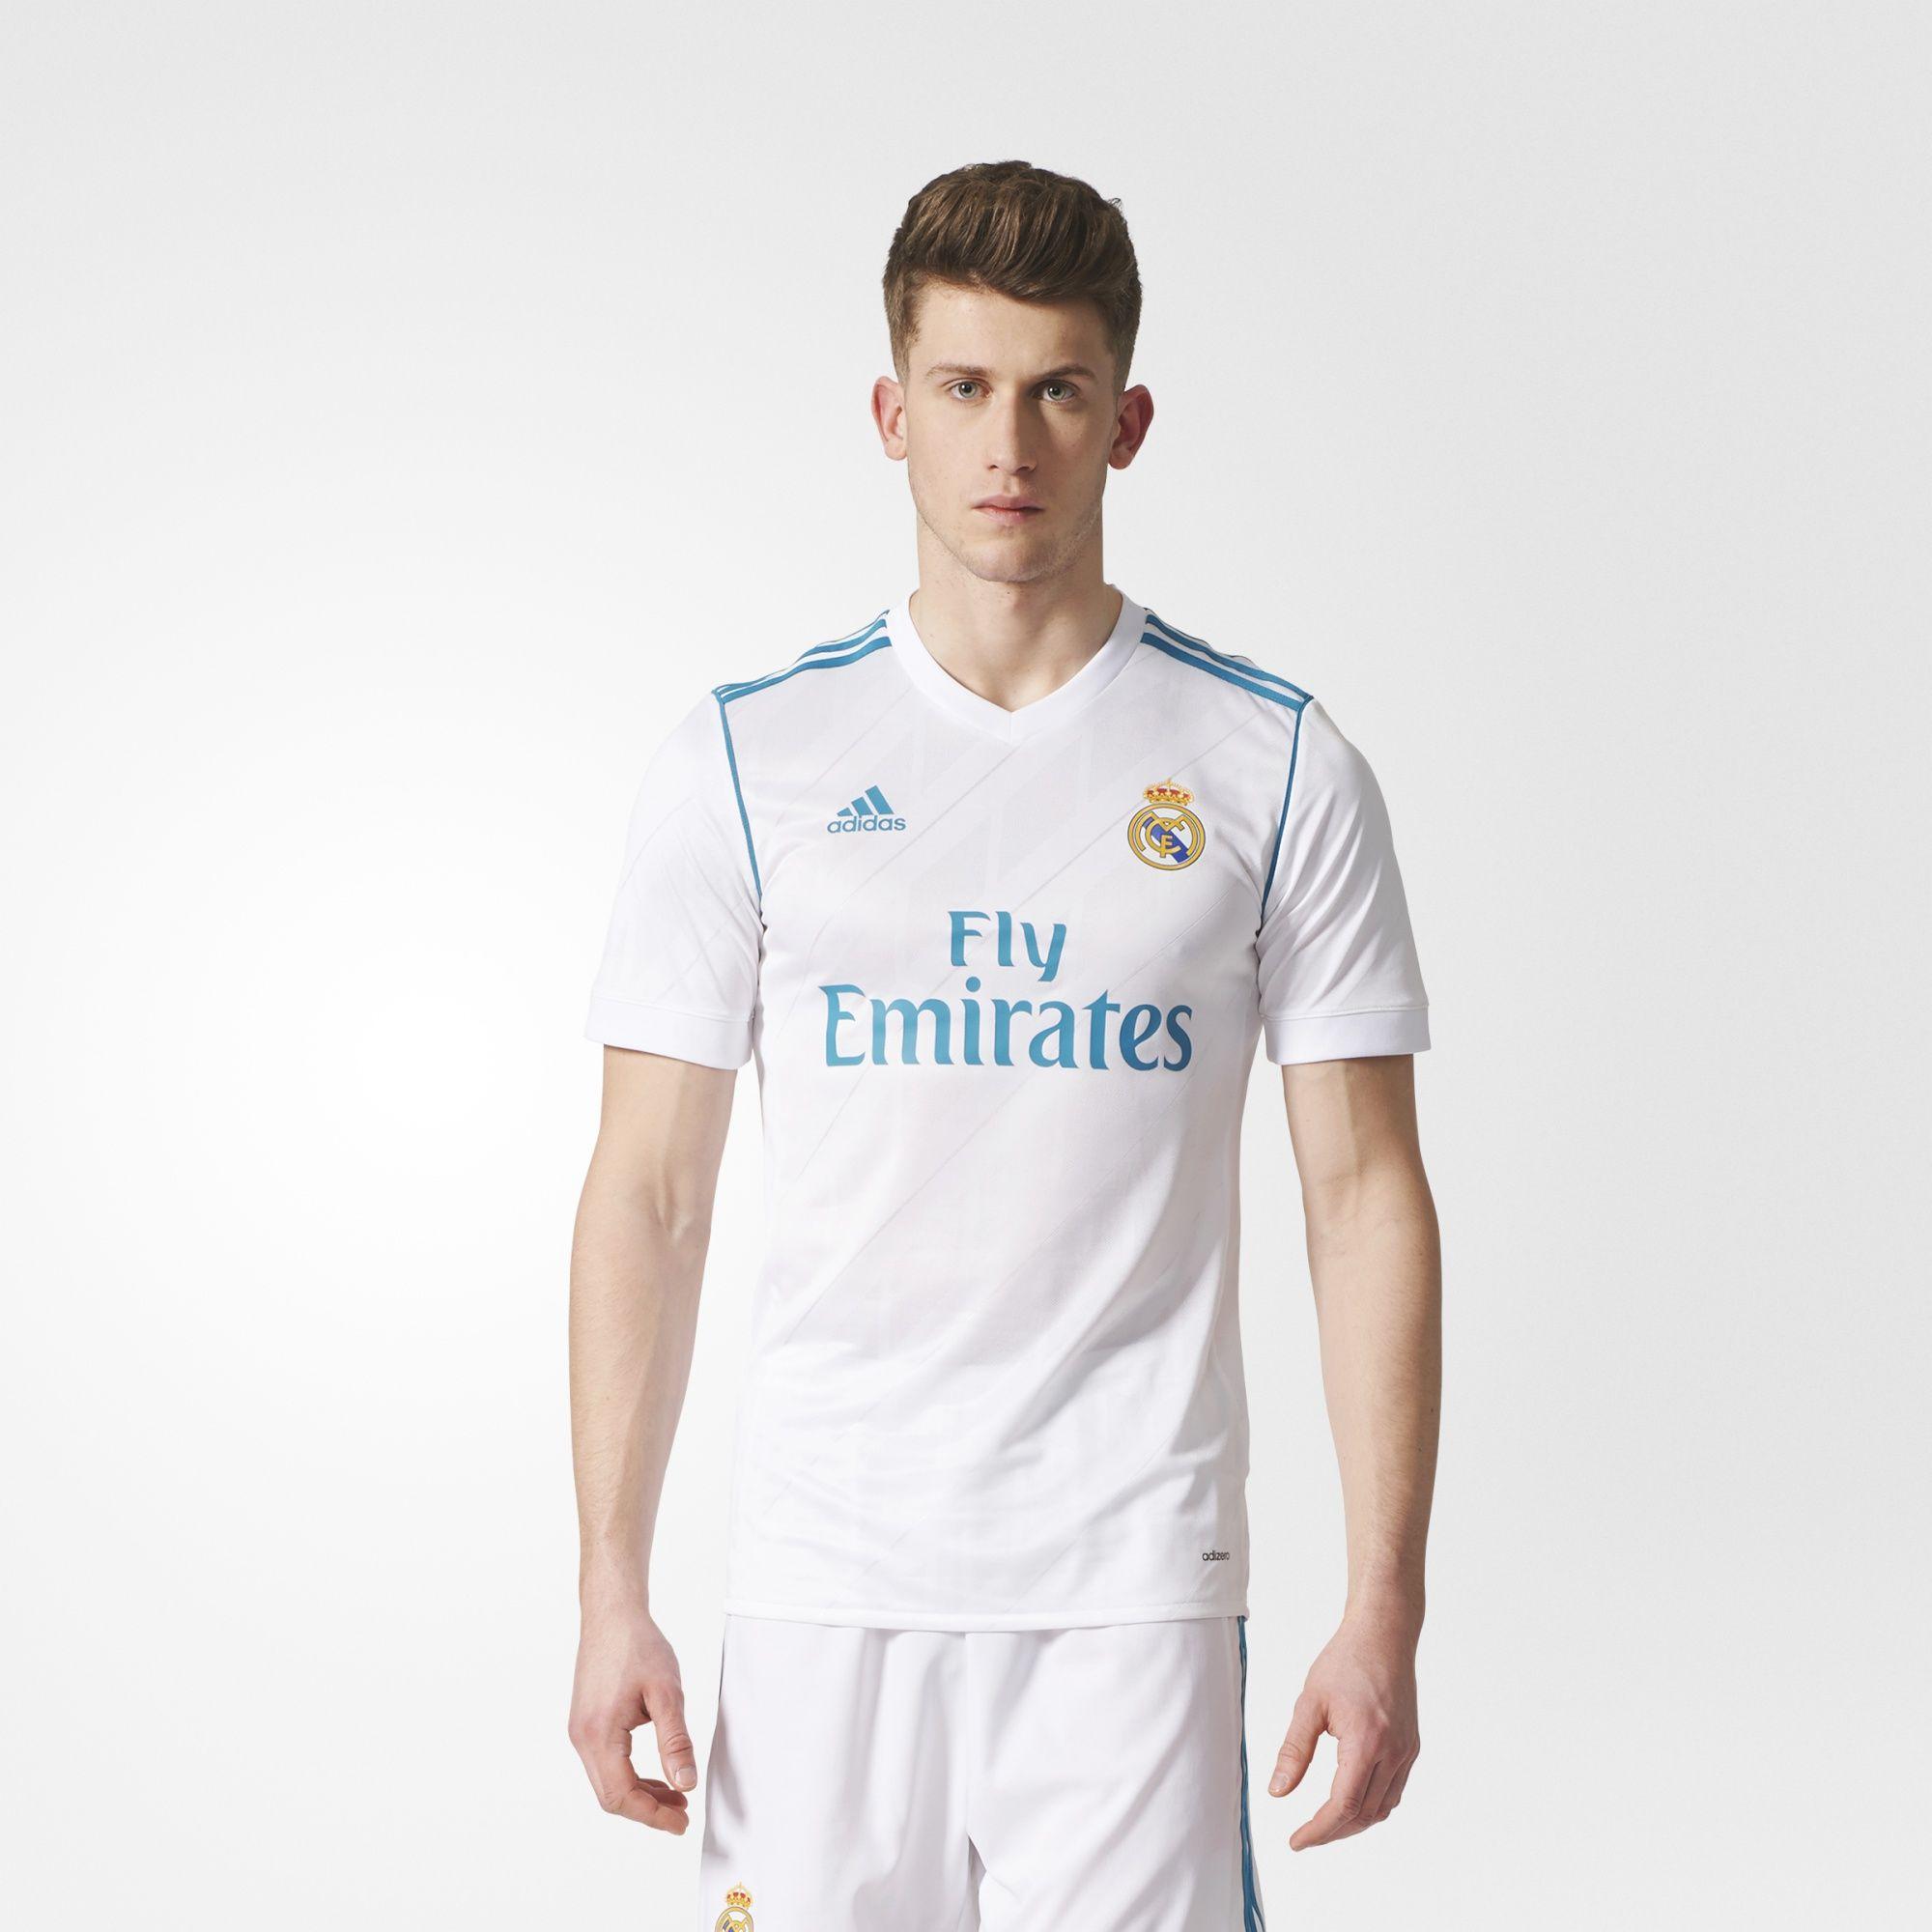 359cc681f ... Real Madrid 17/18 Adidas Third Kit · Click to enlarge image  real_madrid_17_18_adidas_home_kit_a.jpg ...